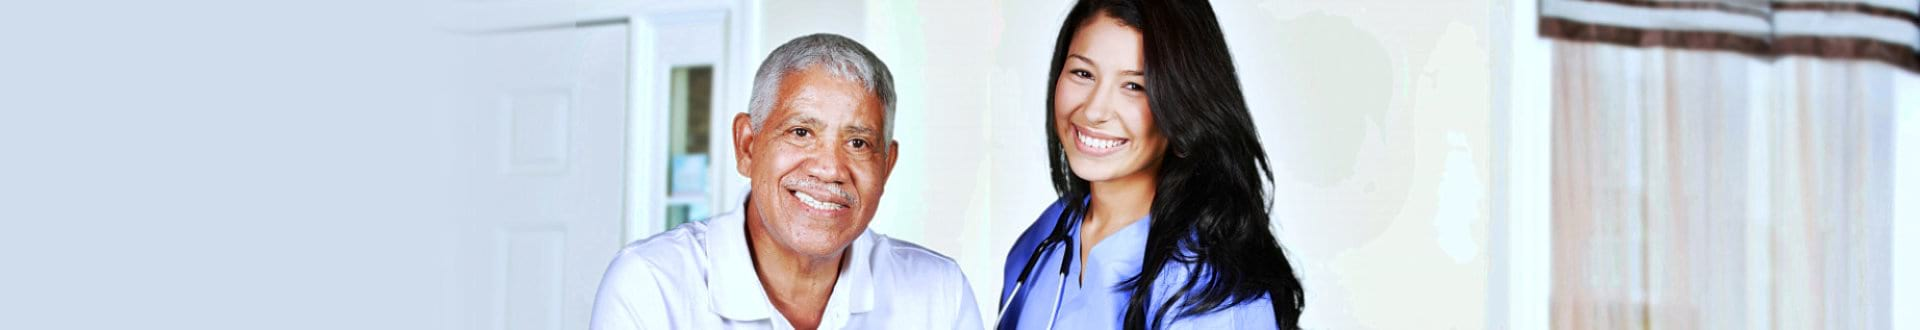 senior man with female caregiver smiling